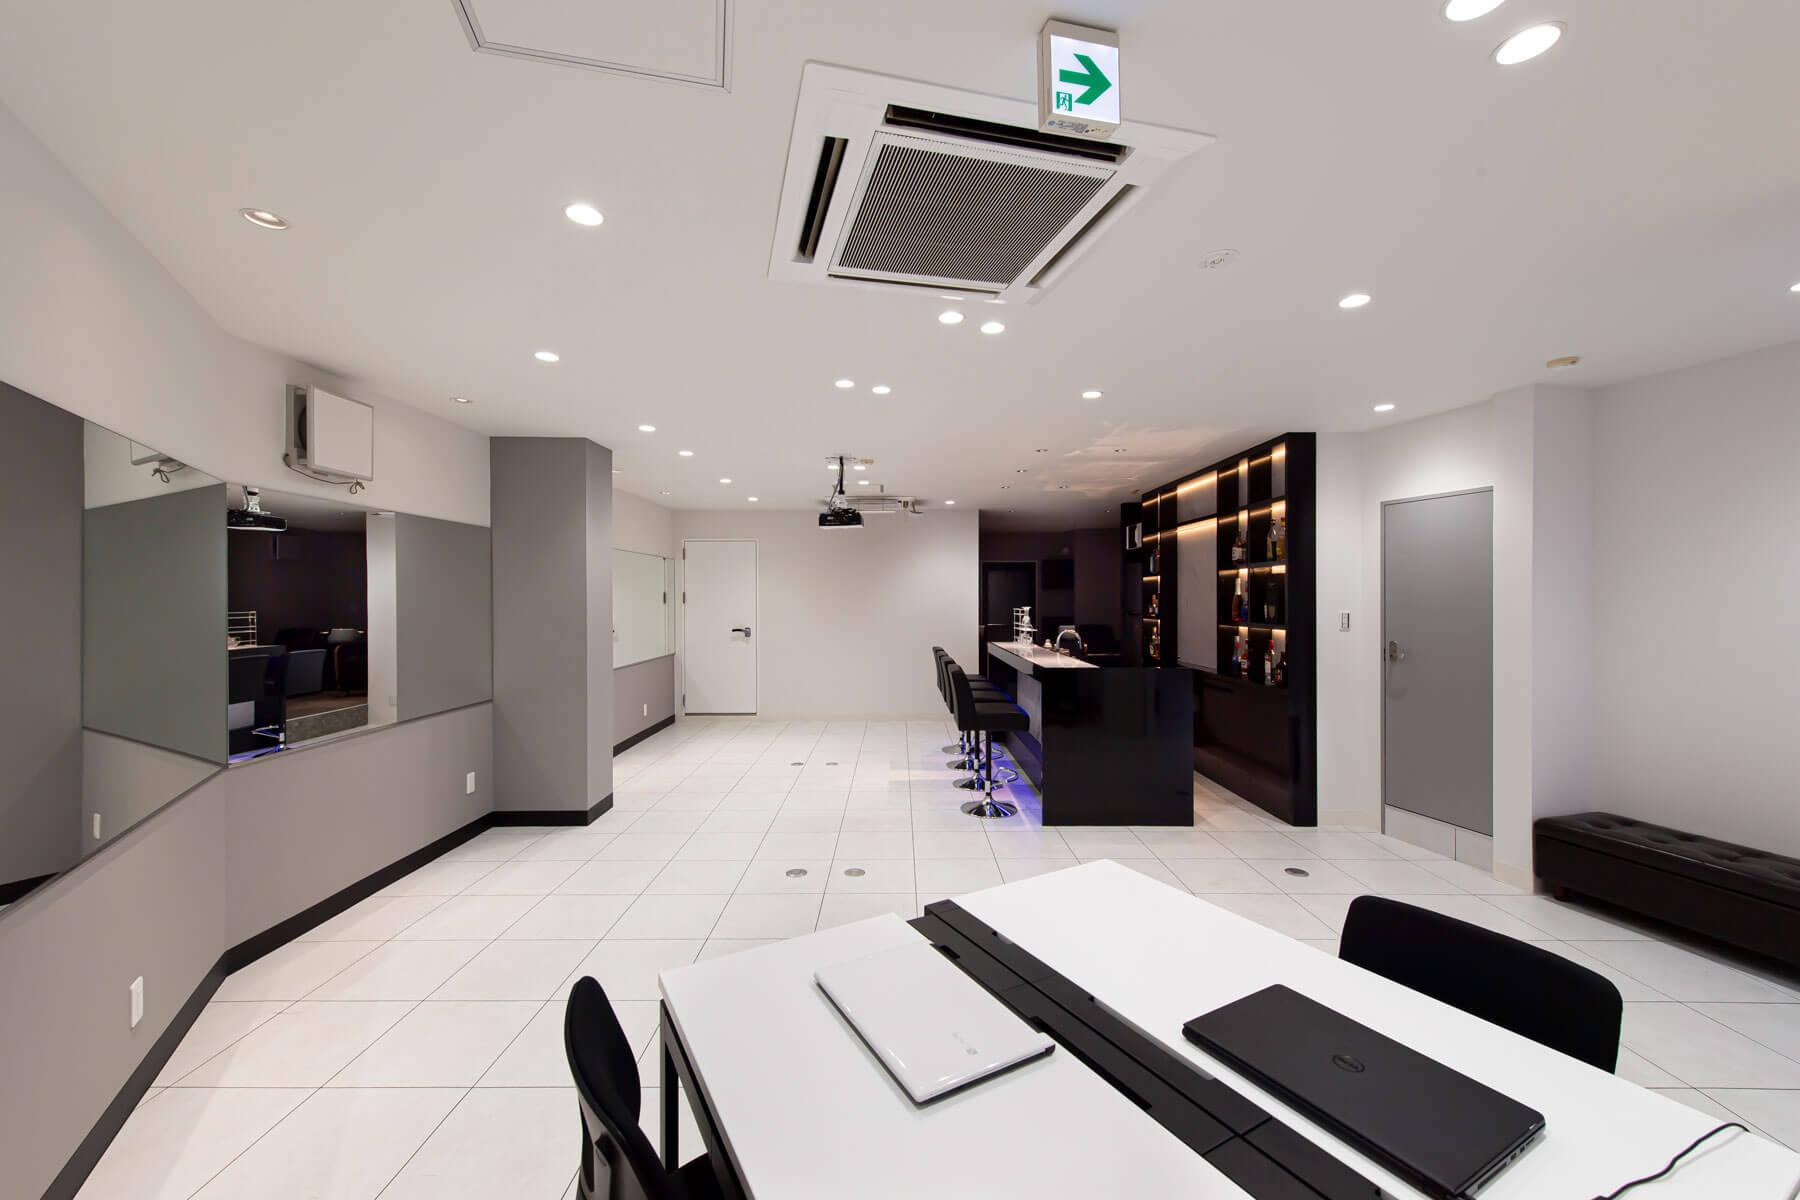 M.O.E. 藤沢オフィス/Kanagawa